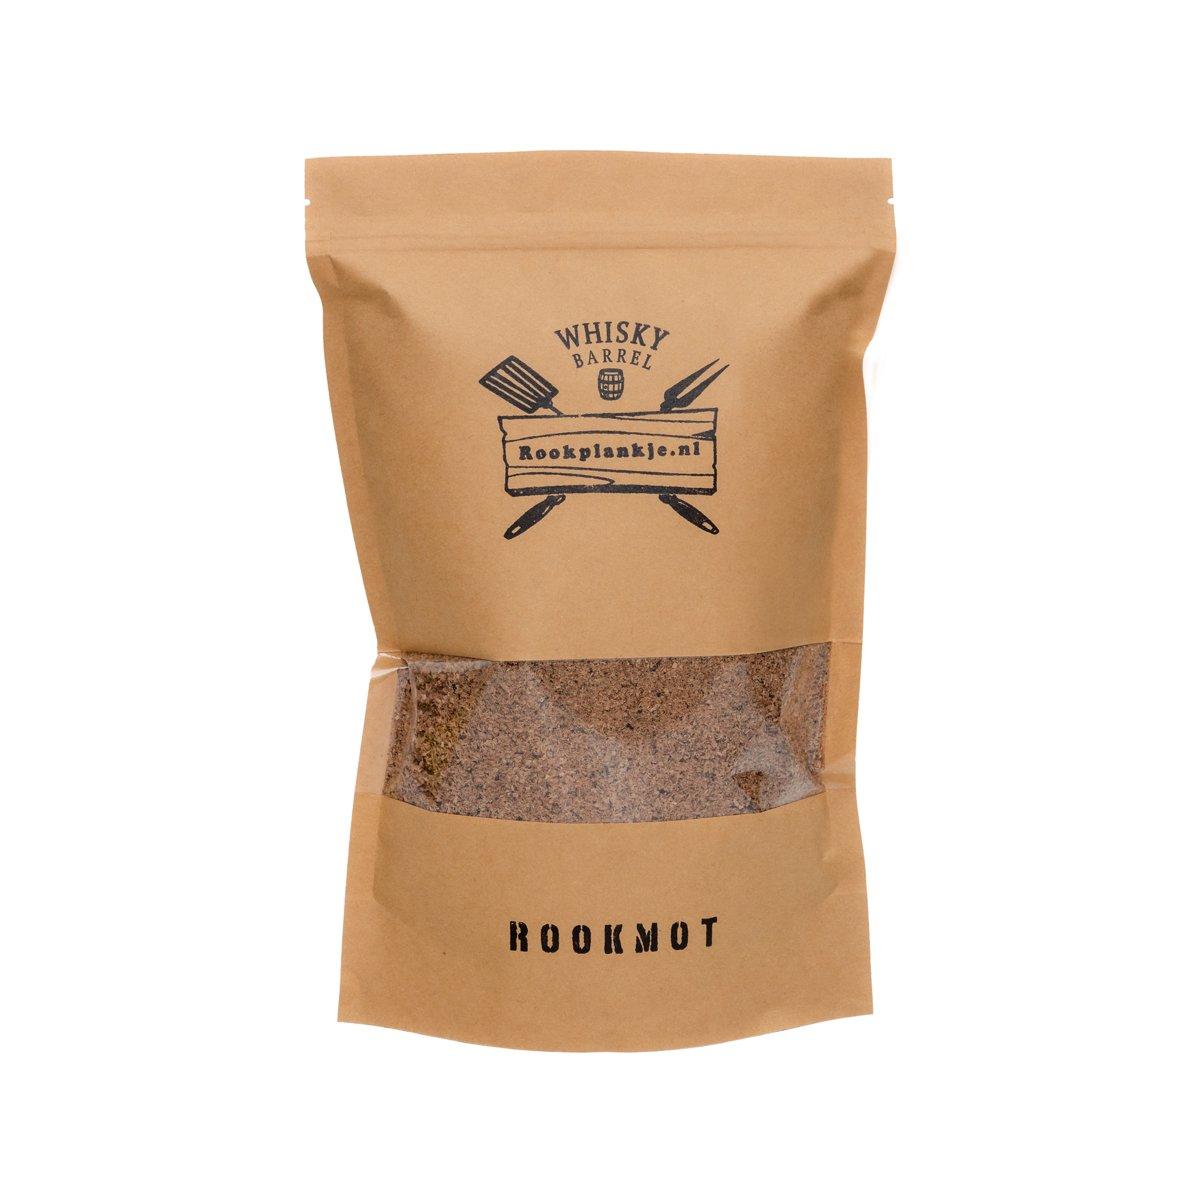 Rookmot Whisky Barrel 1,5 L kopen